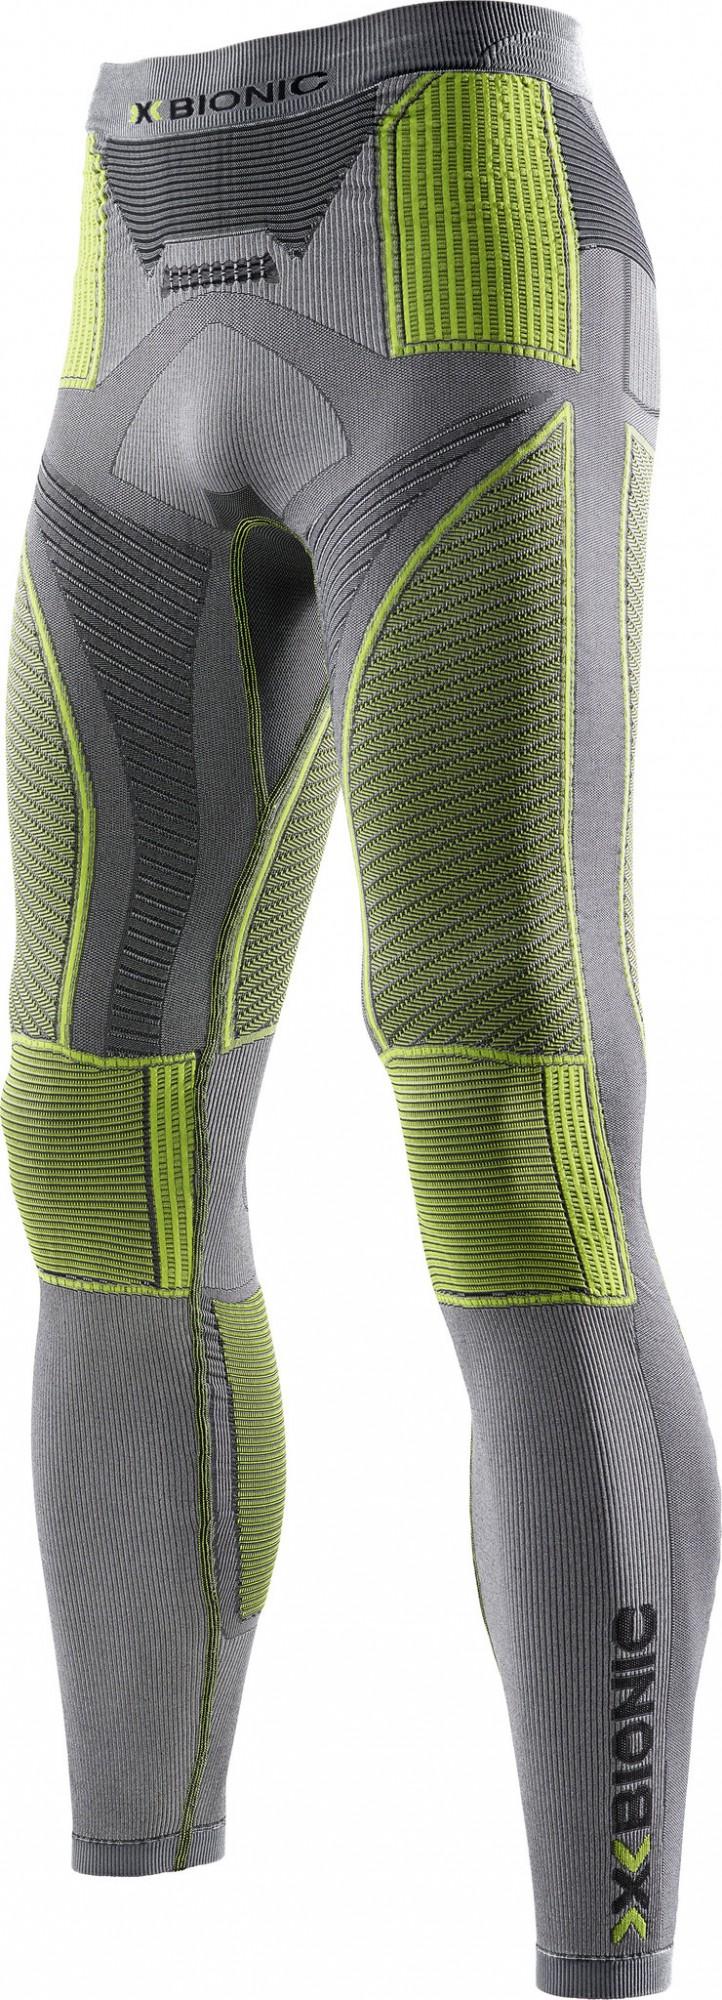 X-Bionic Man Radiactor Evo UW Pants Long - Herren Funktionsunterhose - I020316